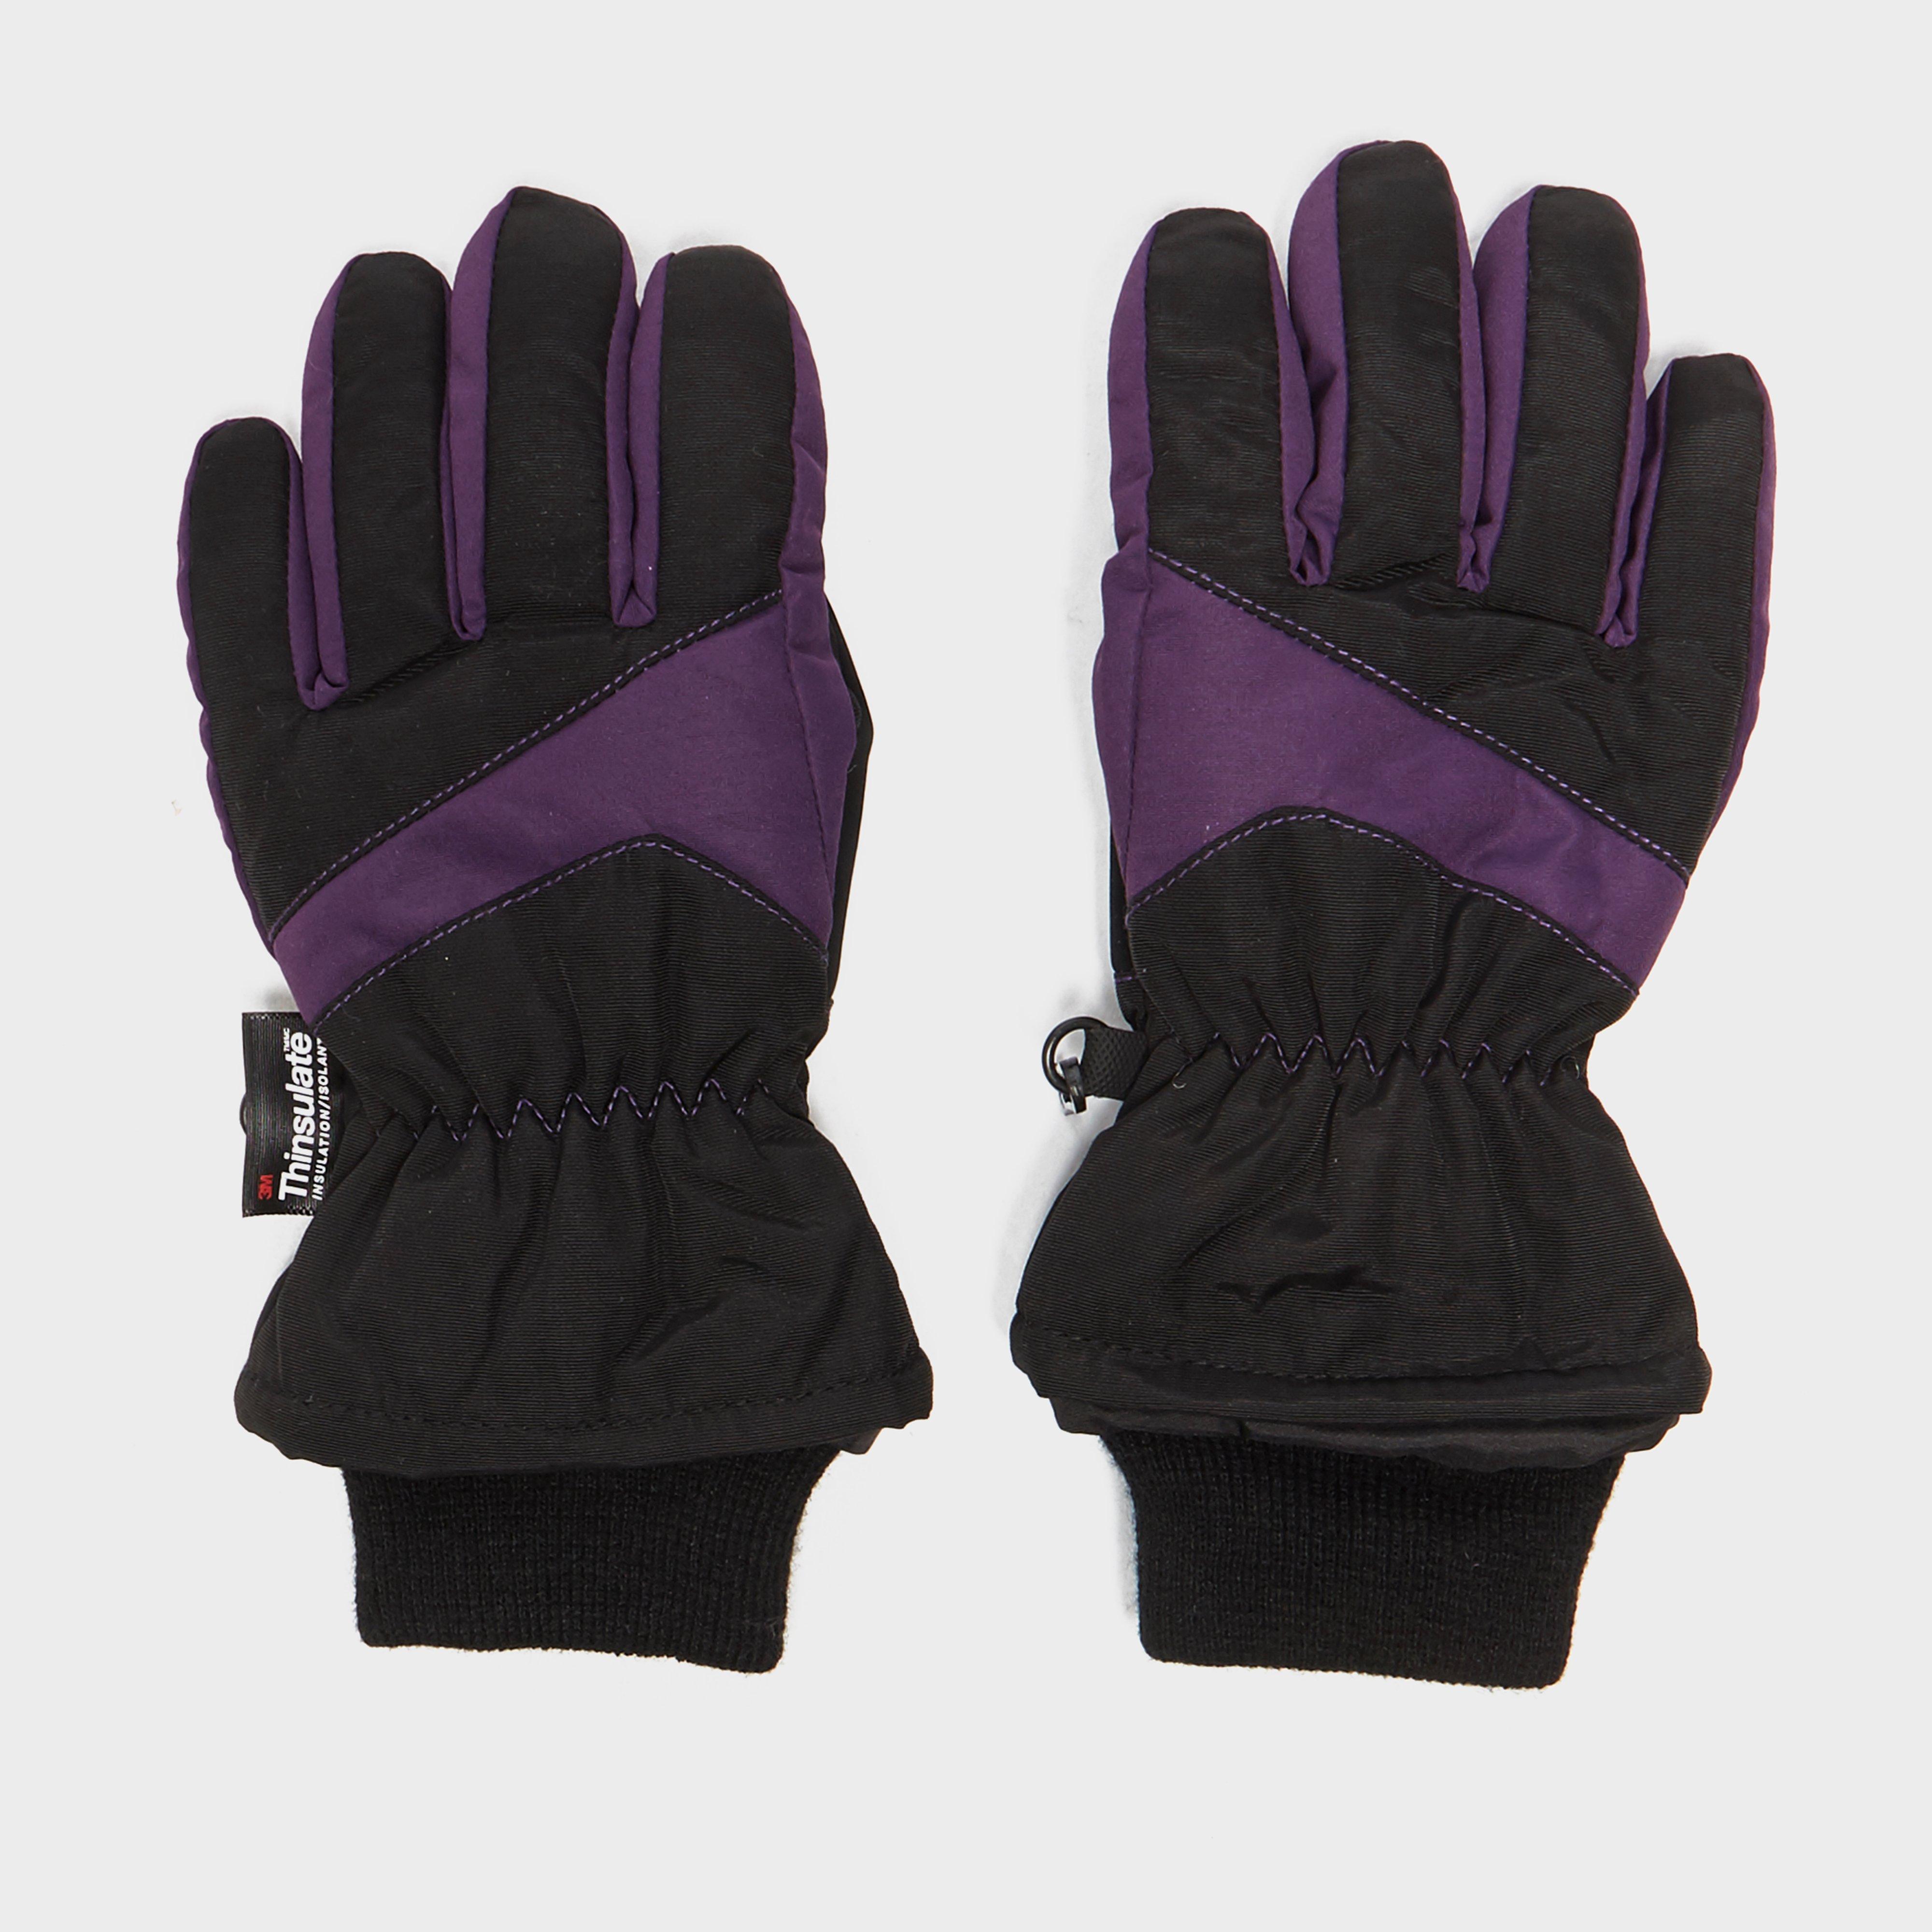 Alpine Boys Ski Gloves, Black